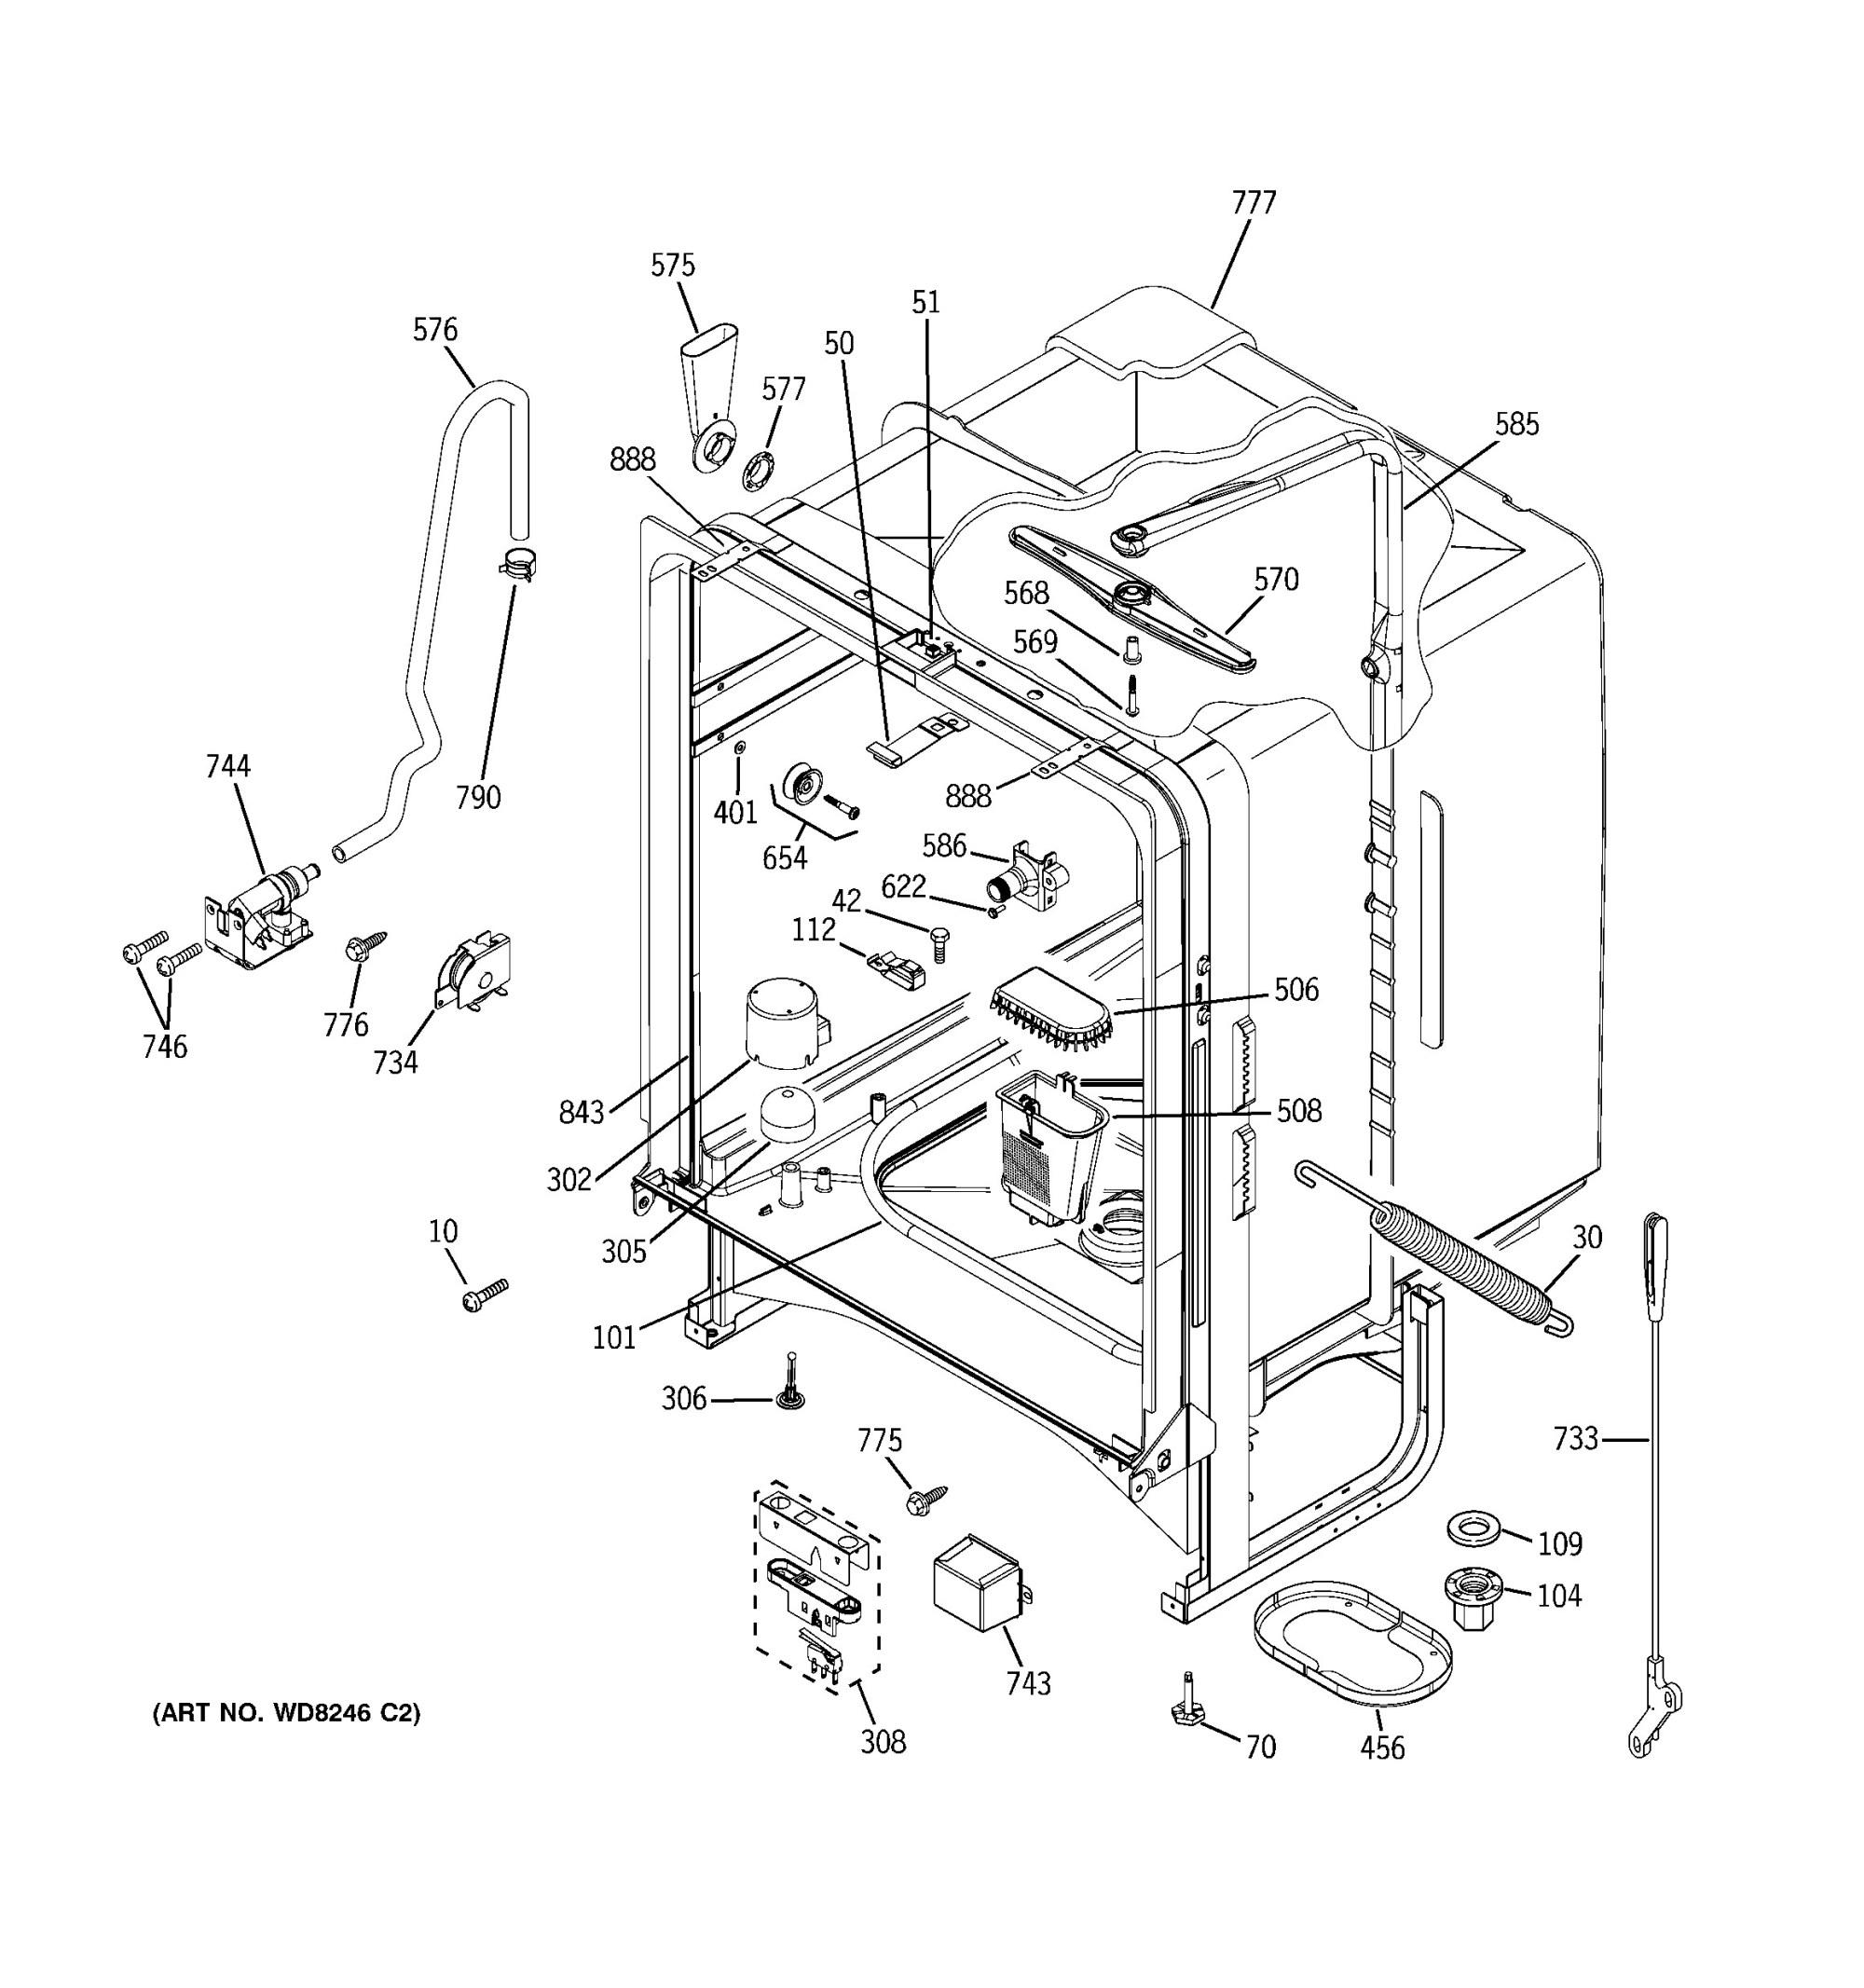 hight resolution of wiring diagram ge nautilus dishwasher wiring library  dishwasher parts diagram as well ge